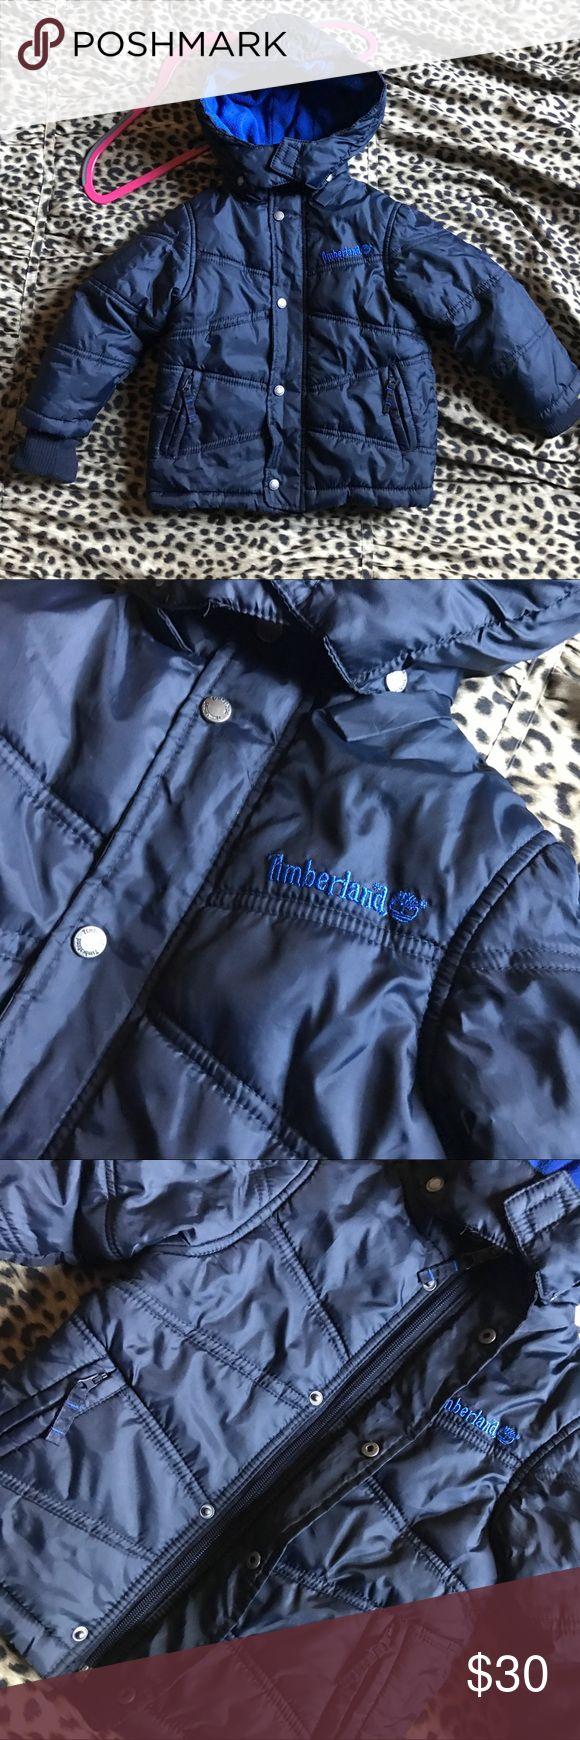 Toddler Boys Timberland Winter Coat Timberland Winter Coat Toddler Boys 24M/2T Dark blue puffer coat with zipper and snap button closure. Fleece lined. Timberland Jackets & Coats Puffers